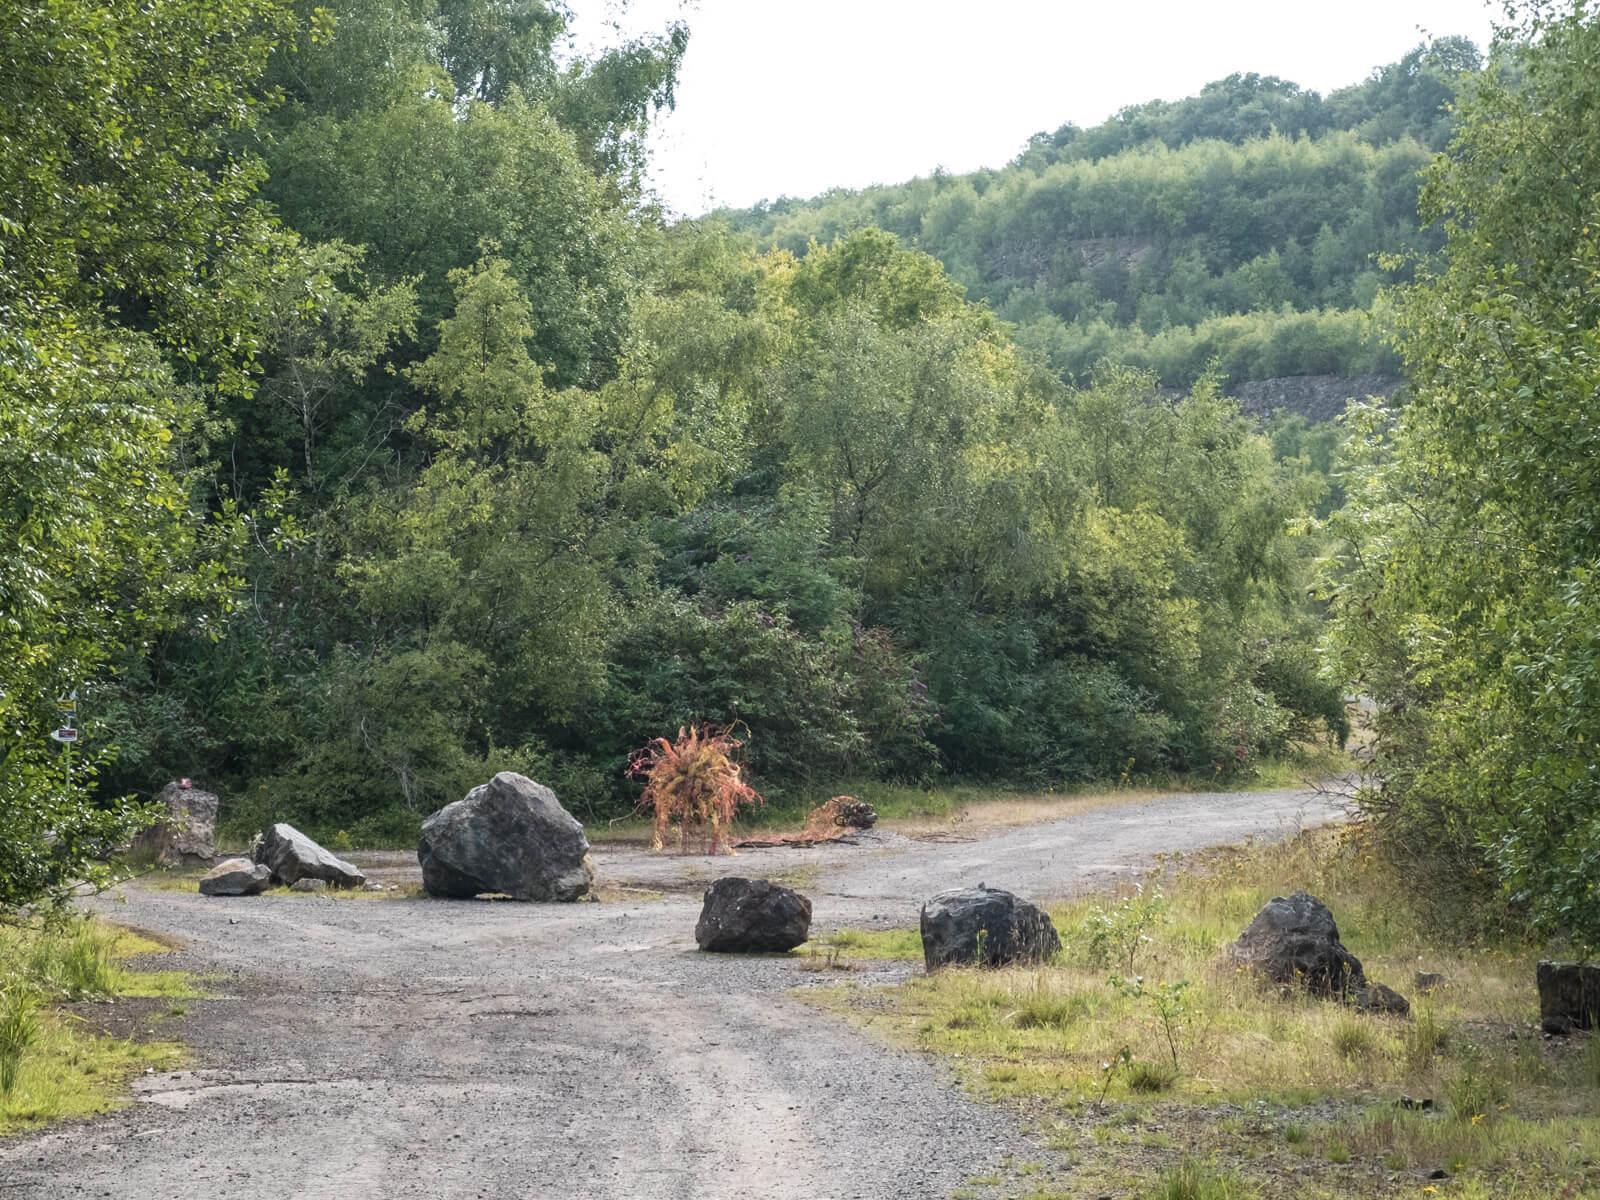 Cirri at Westdown/Asham quarry